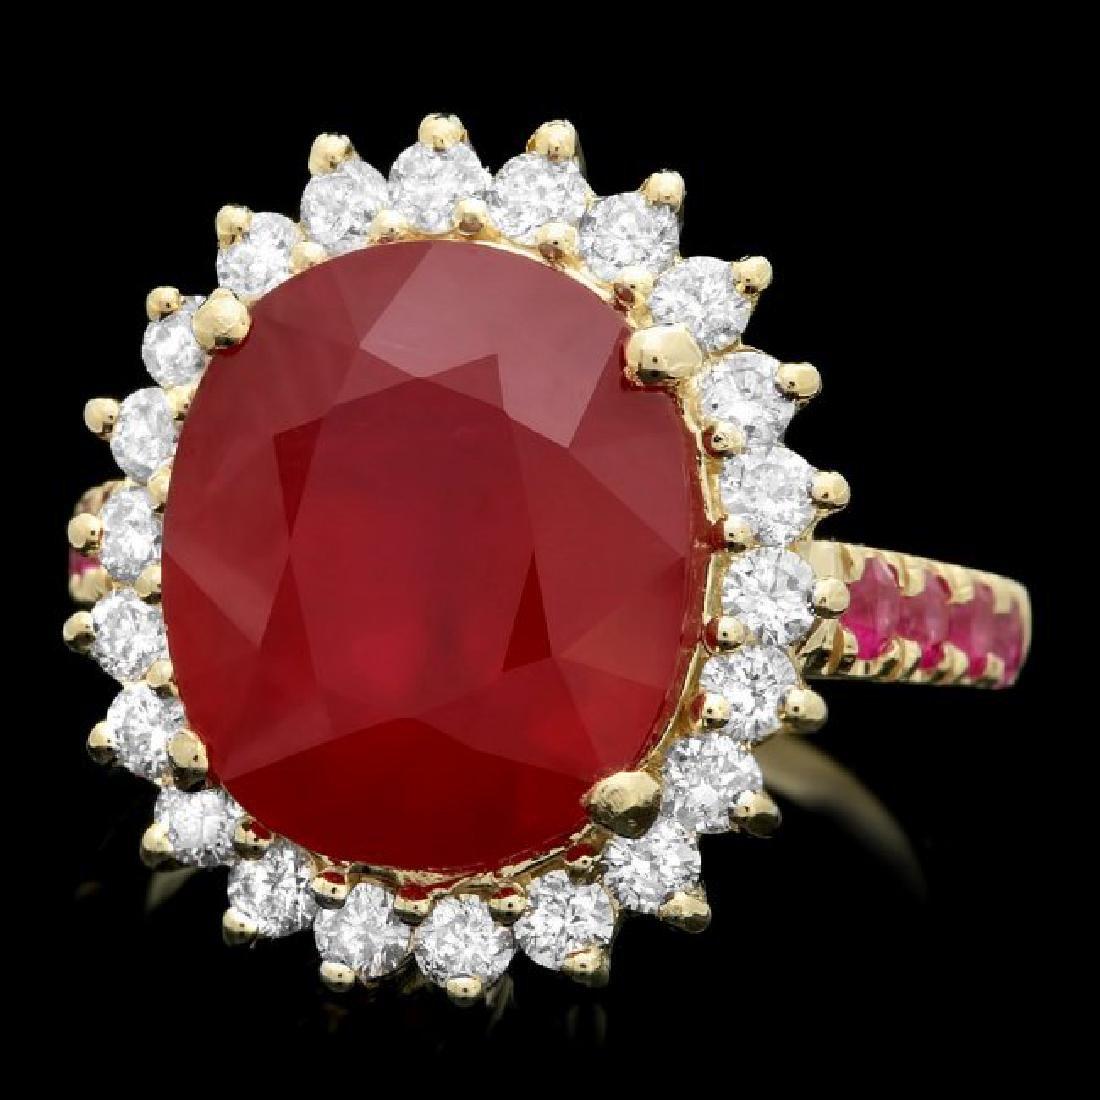 14k Yellow Gold 10.3ct Ruby 0.80ct Diamond Ring